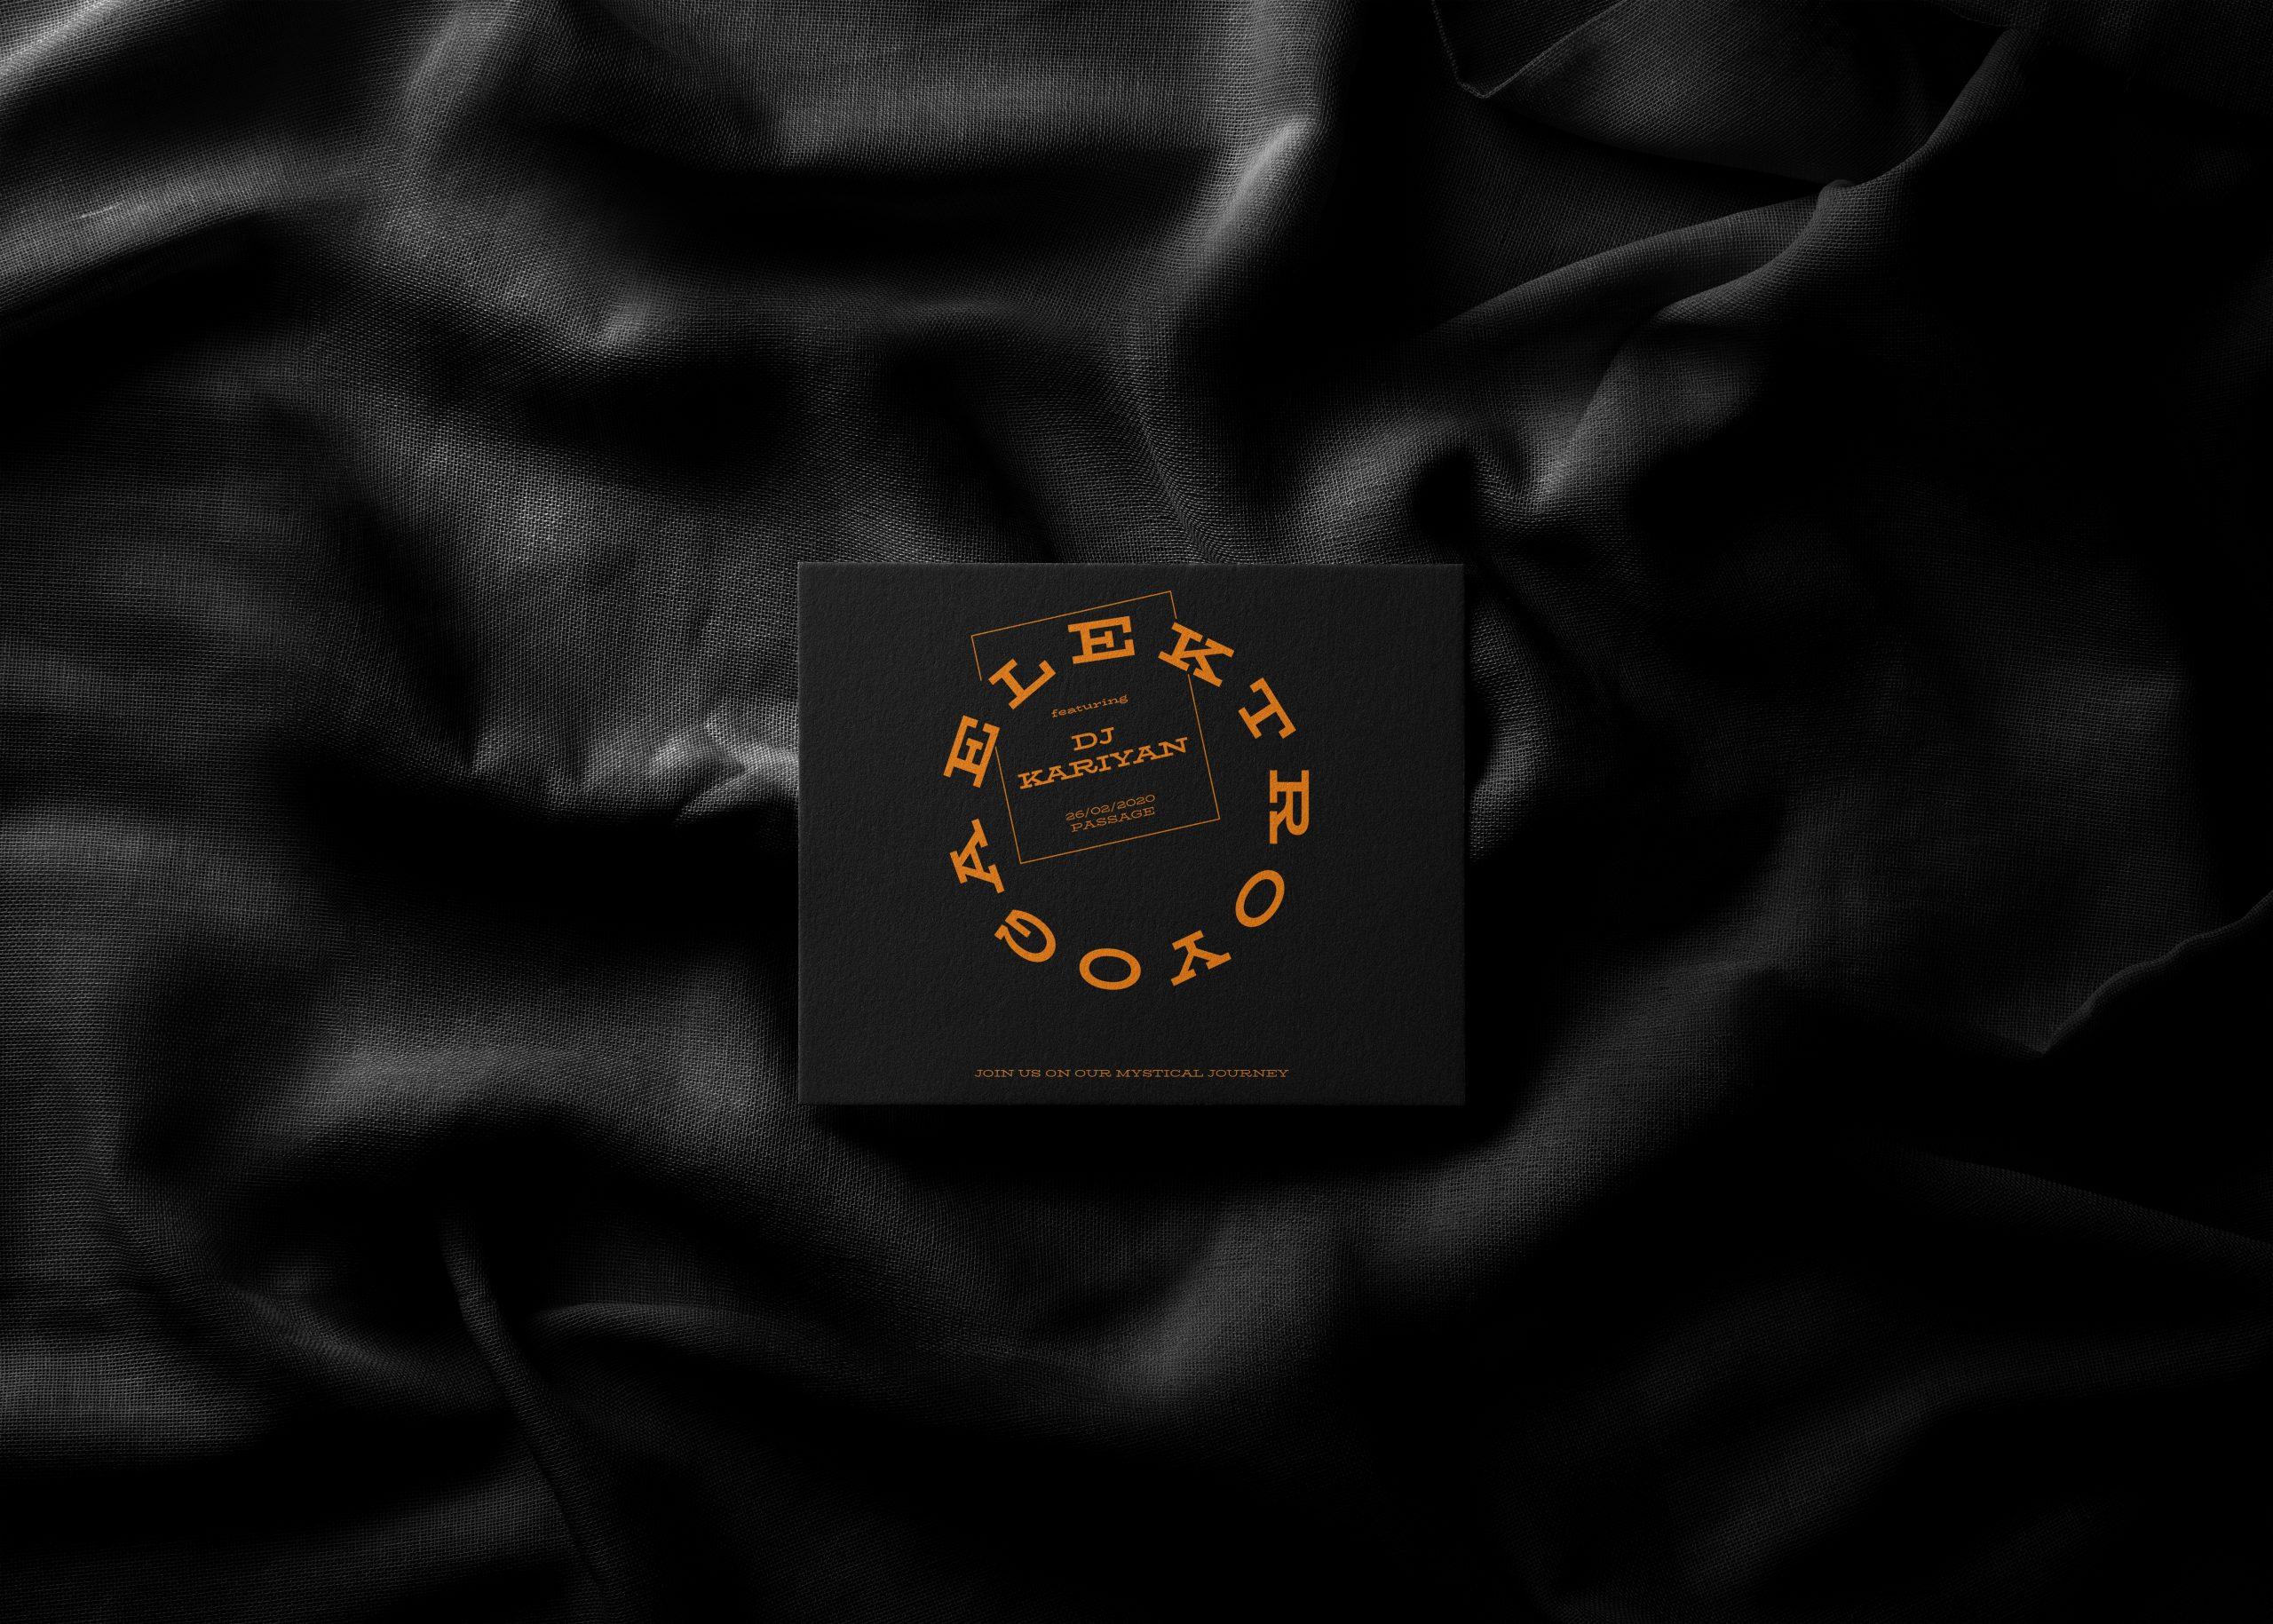 EY_specialDJ_Invitation-Card-Mockup-Vol-10